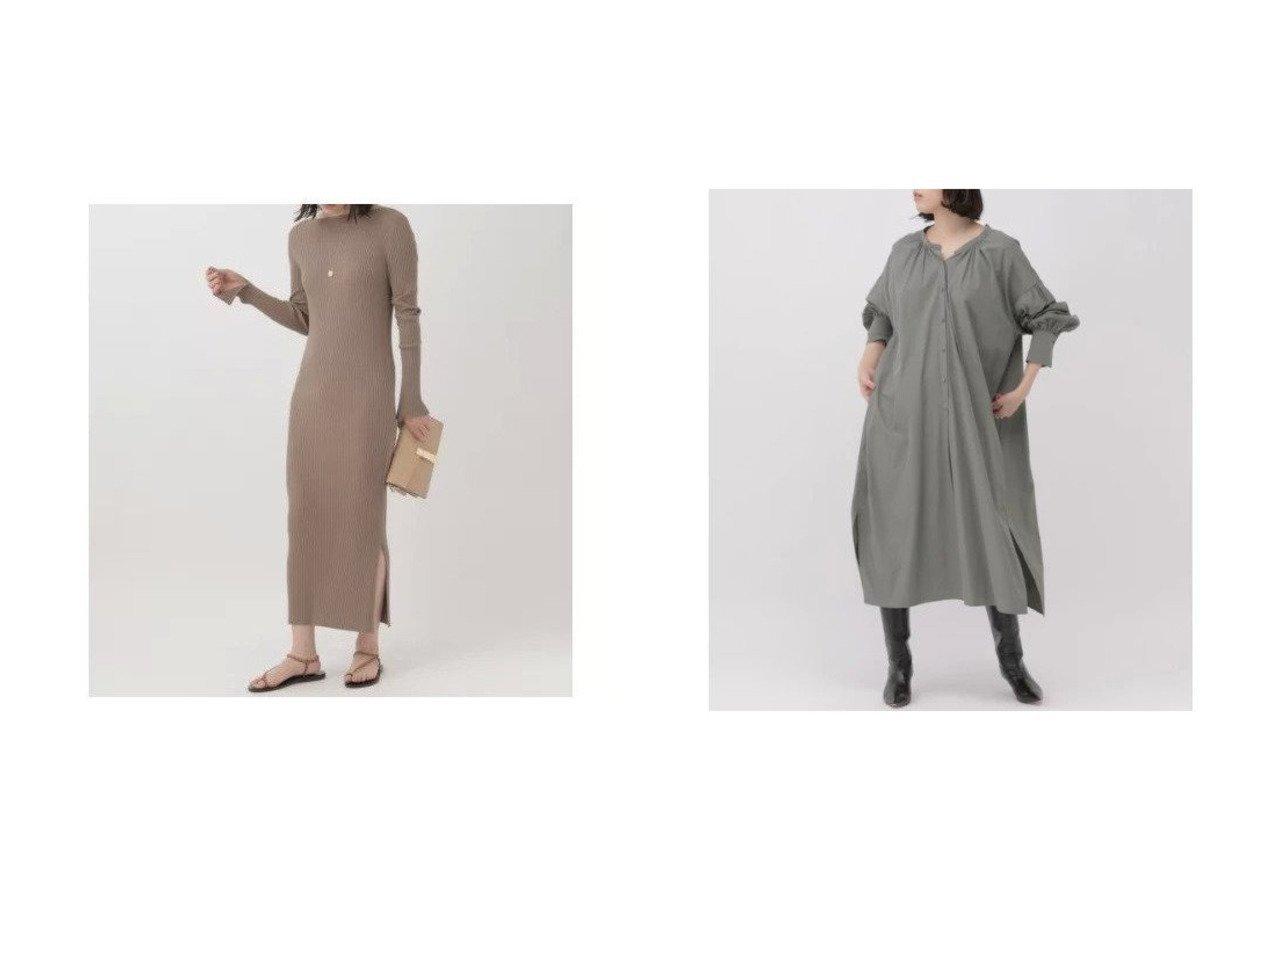 【Chaos/カオス】のシルクコンリブニットワンピース&プルプギャザーワンピース 【ワンピース・ドレス】おすすめ!人気、トレンド・レディースファッションの通販 おすすめで人気の流行・トレンド、ファッションの通販商品 インテリア・家具・メンズファッション・キッズファッション・レディースファッション・服の通販 founy(ファニー) https://founy.com/ ファッション Fashion レディースファッション WOMEN ワンピース Dress シャツワンピース Shirt Dresses ニットワンピース Knit Dresses おすすめ Recommend ギャザー タイプライター 長袖  ID:crp329100000045562